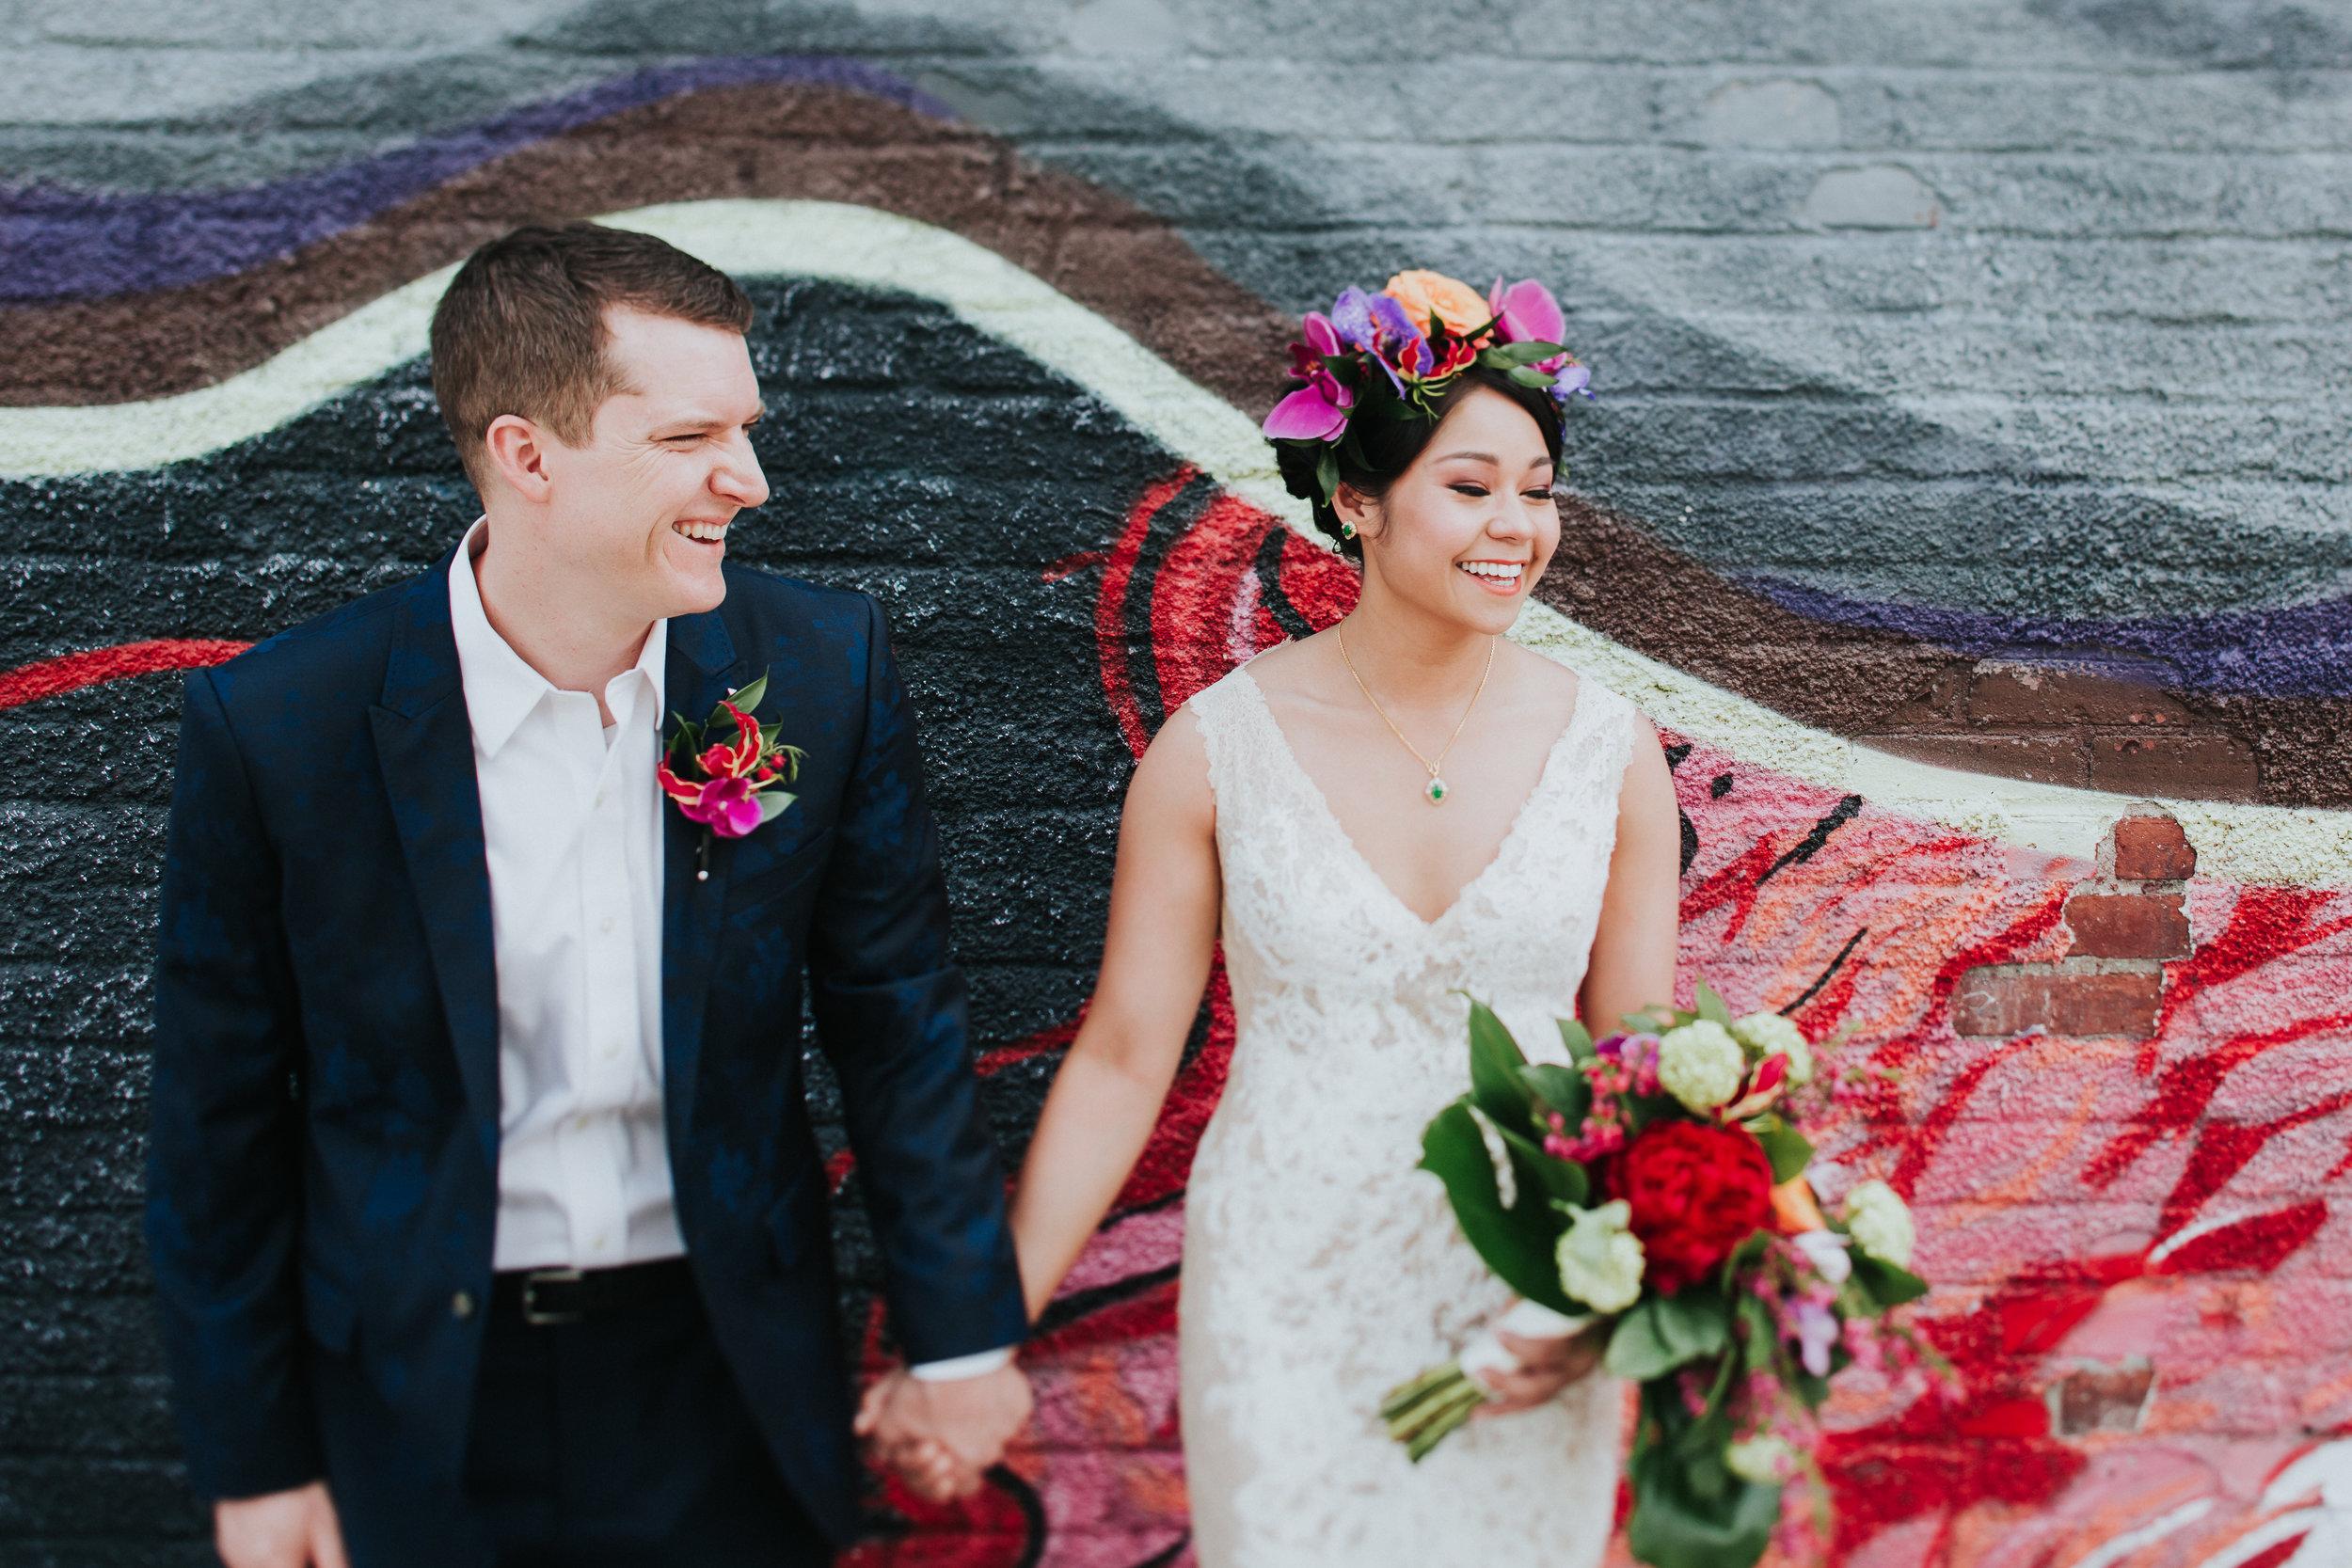 501-union-wedding-photographer